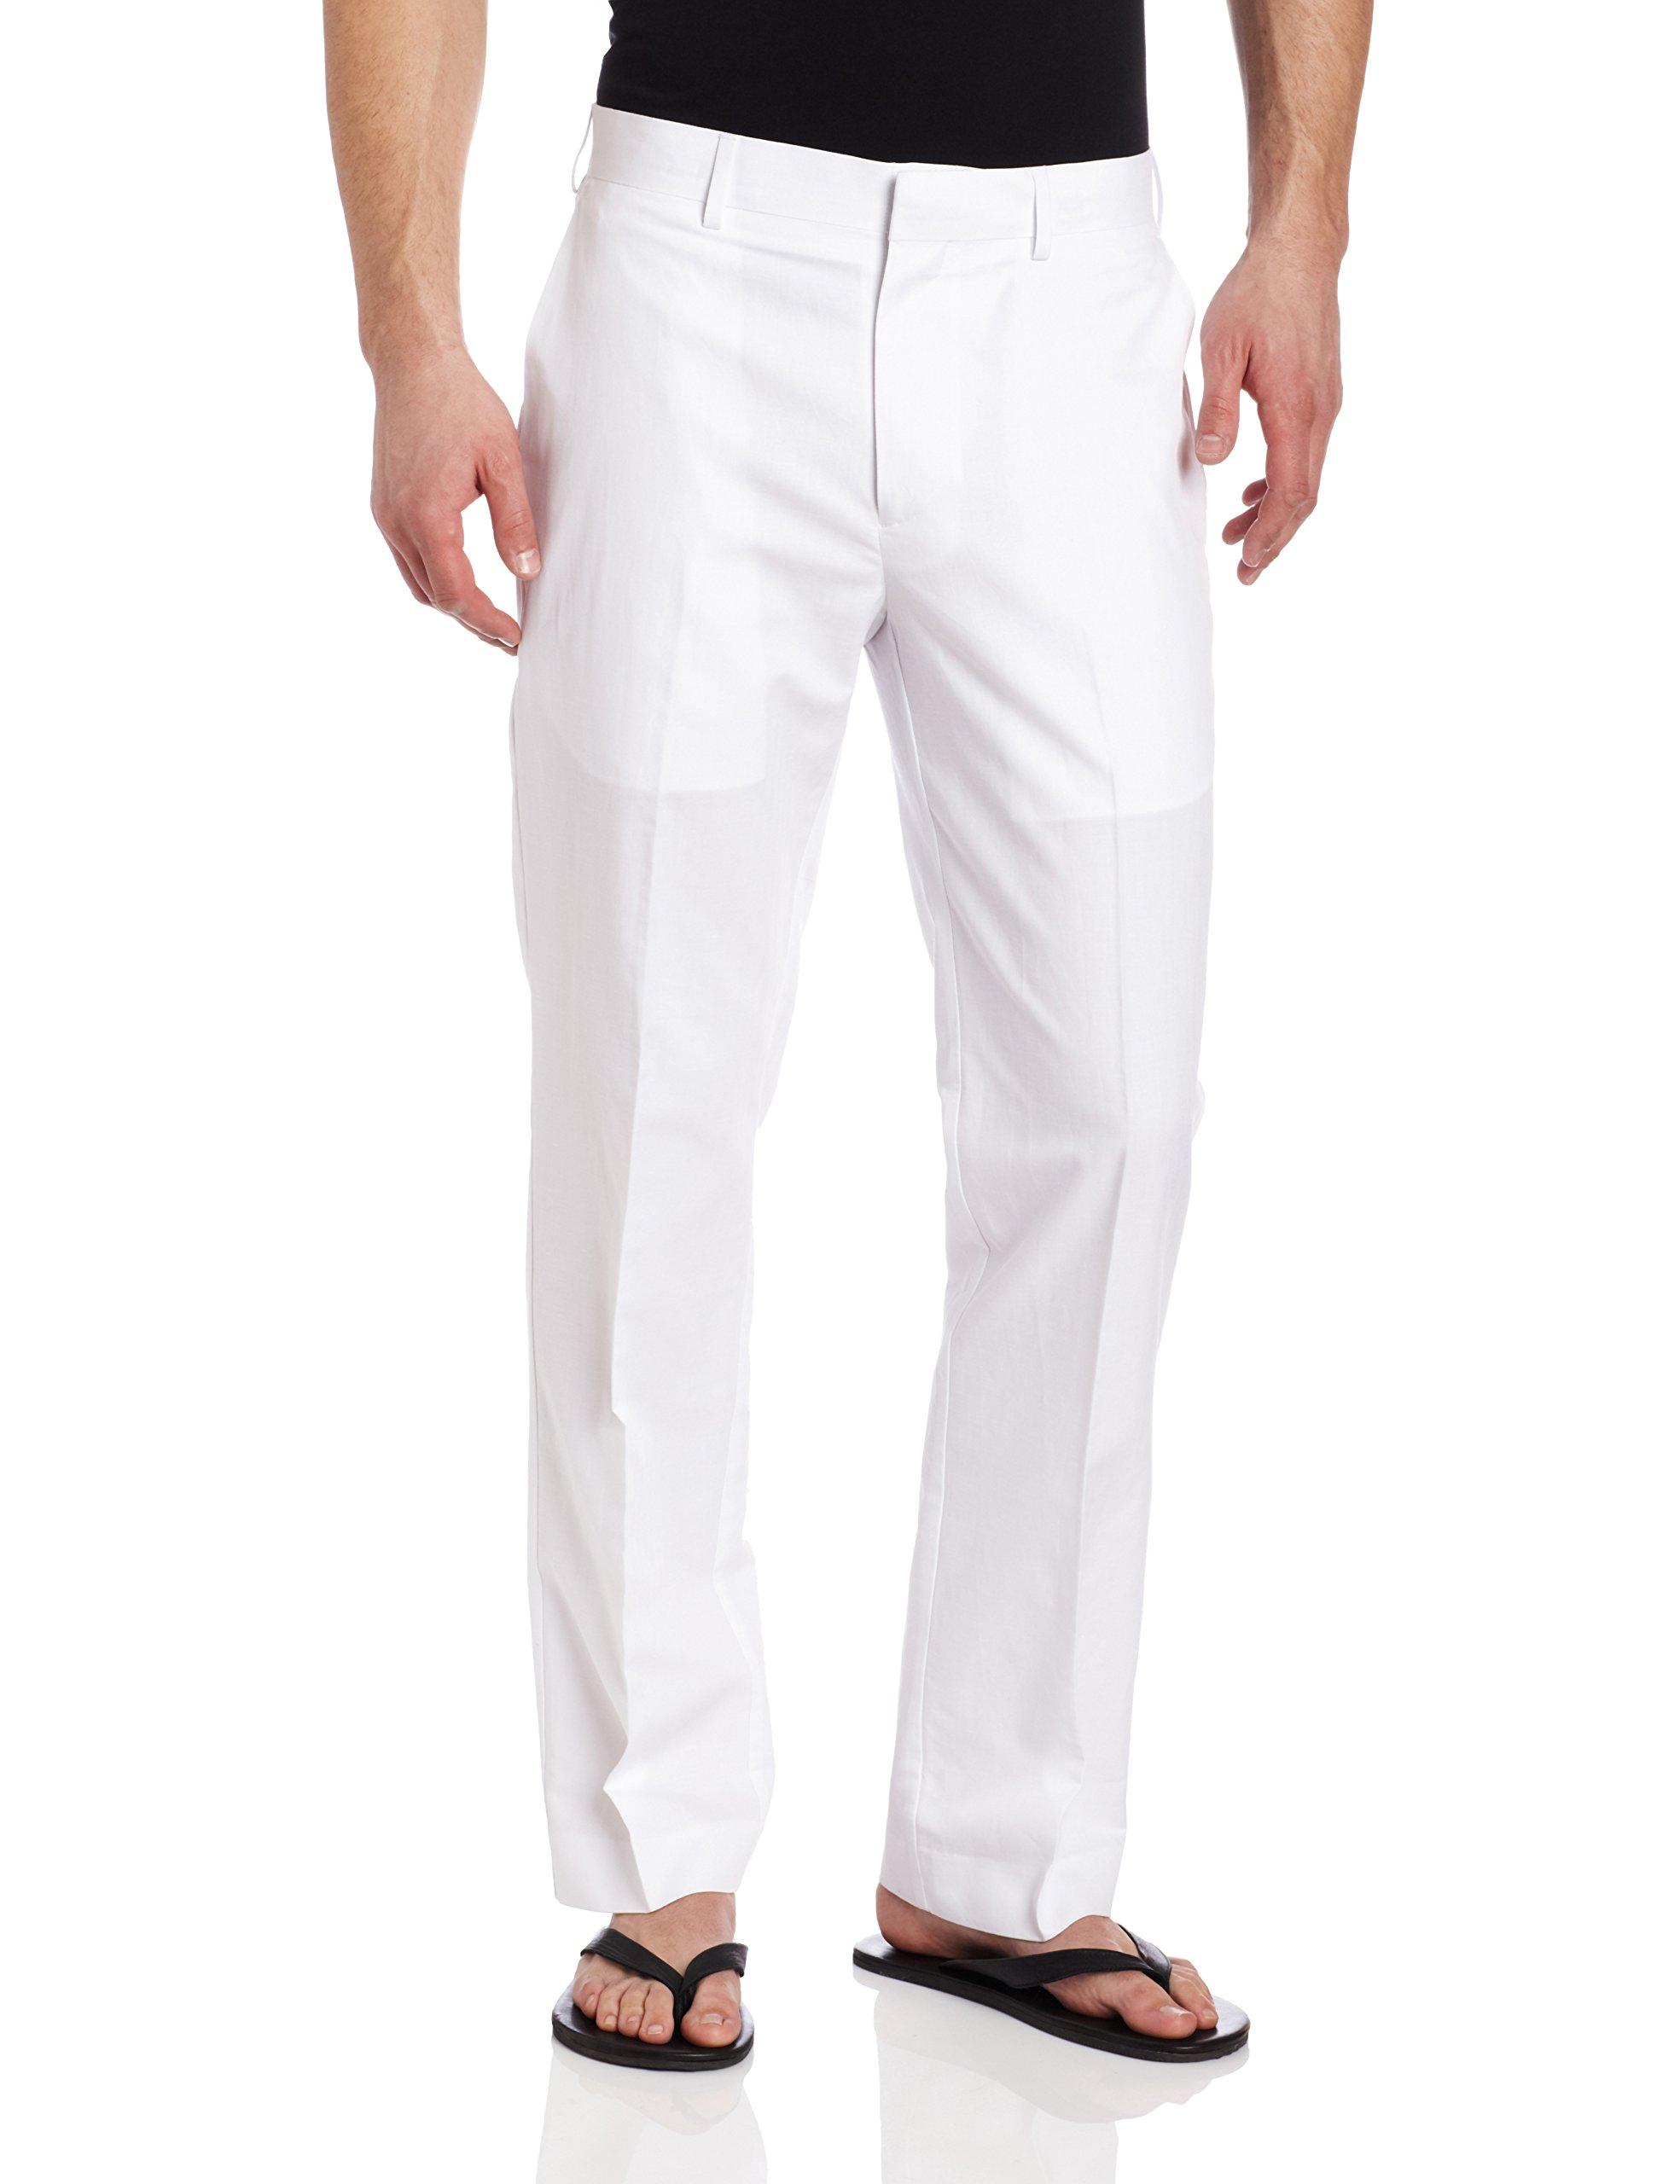 Cubavera Men's Big and Tall Linen-Cotton Herringbone-Textured Pant, Bright White, 50W X 30L